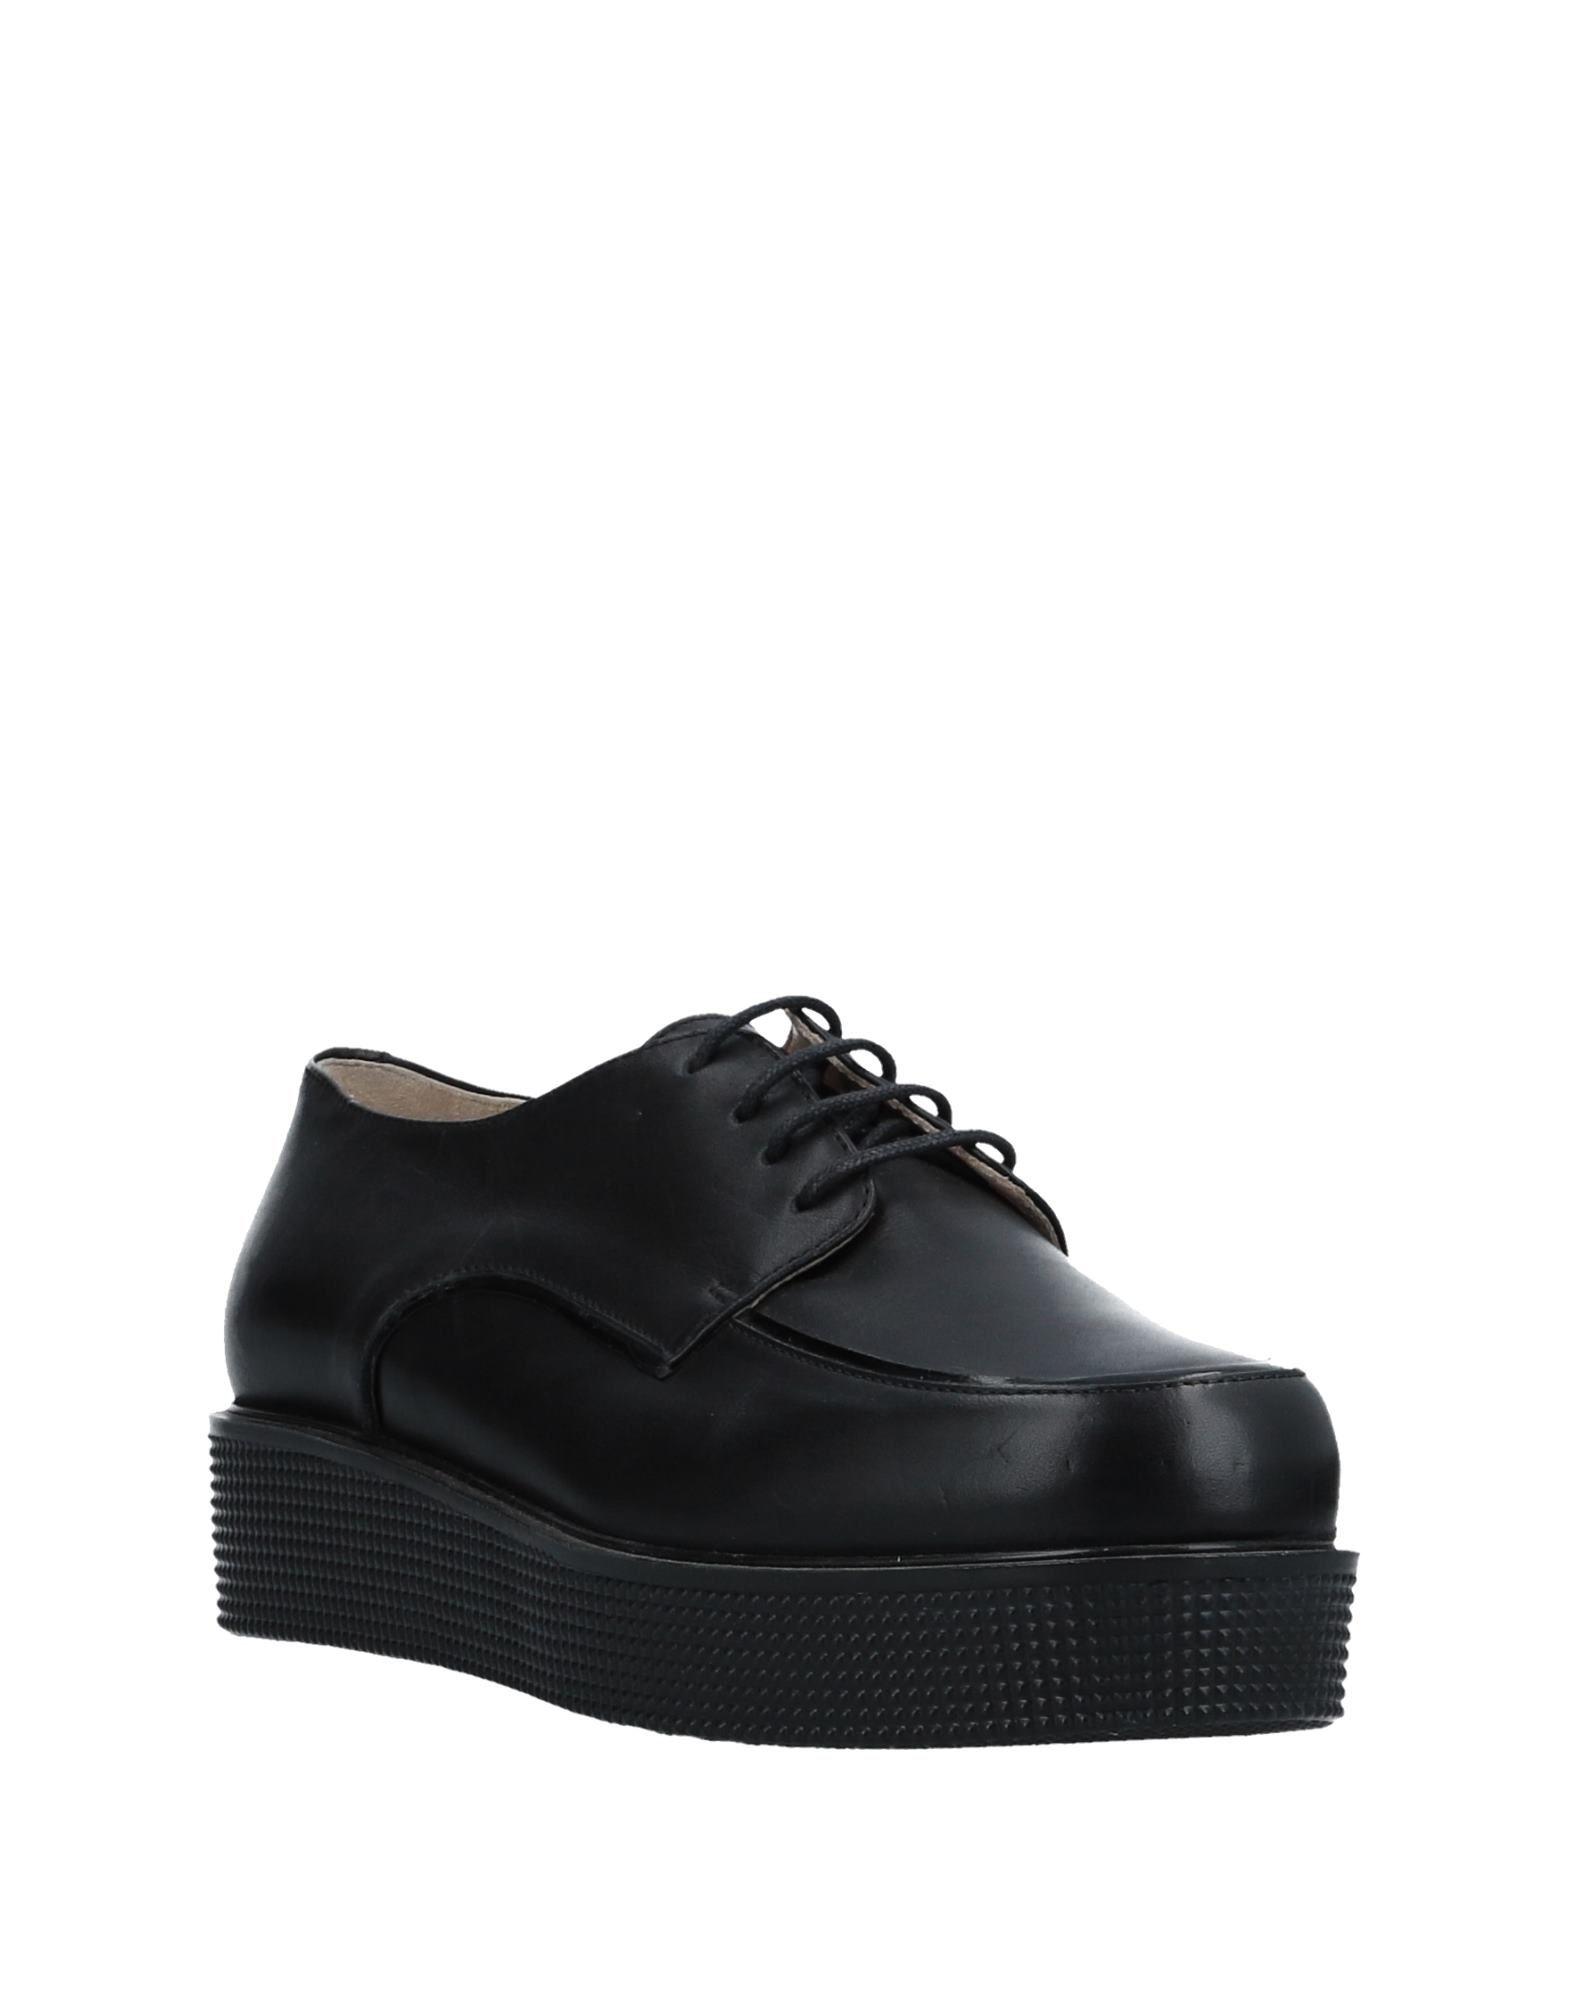 L' Autre Chose Schnürschuhe Damen  11508267BW Neue Schuhe